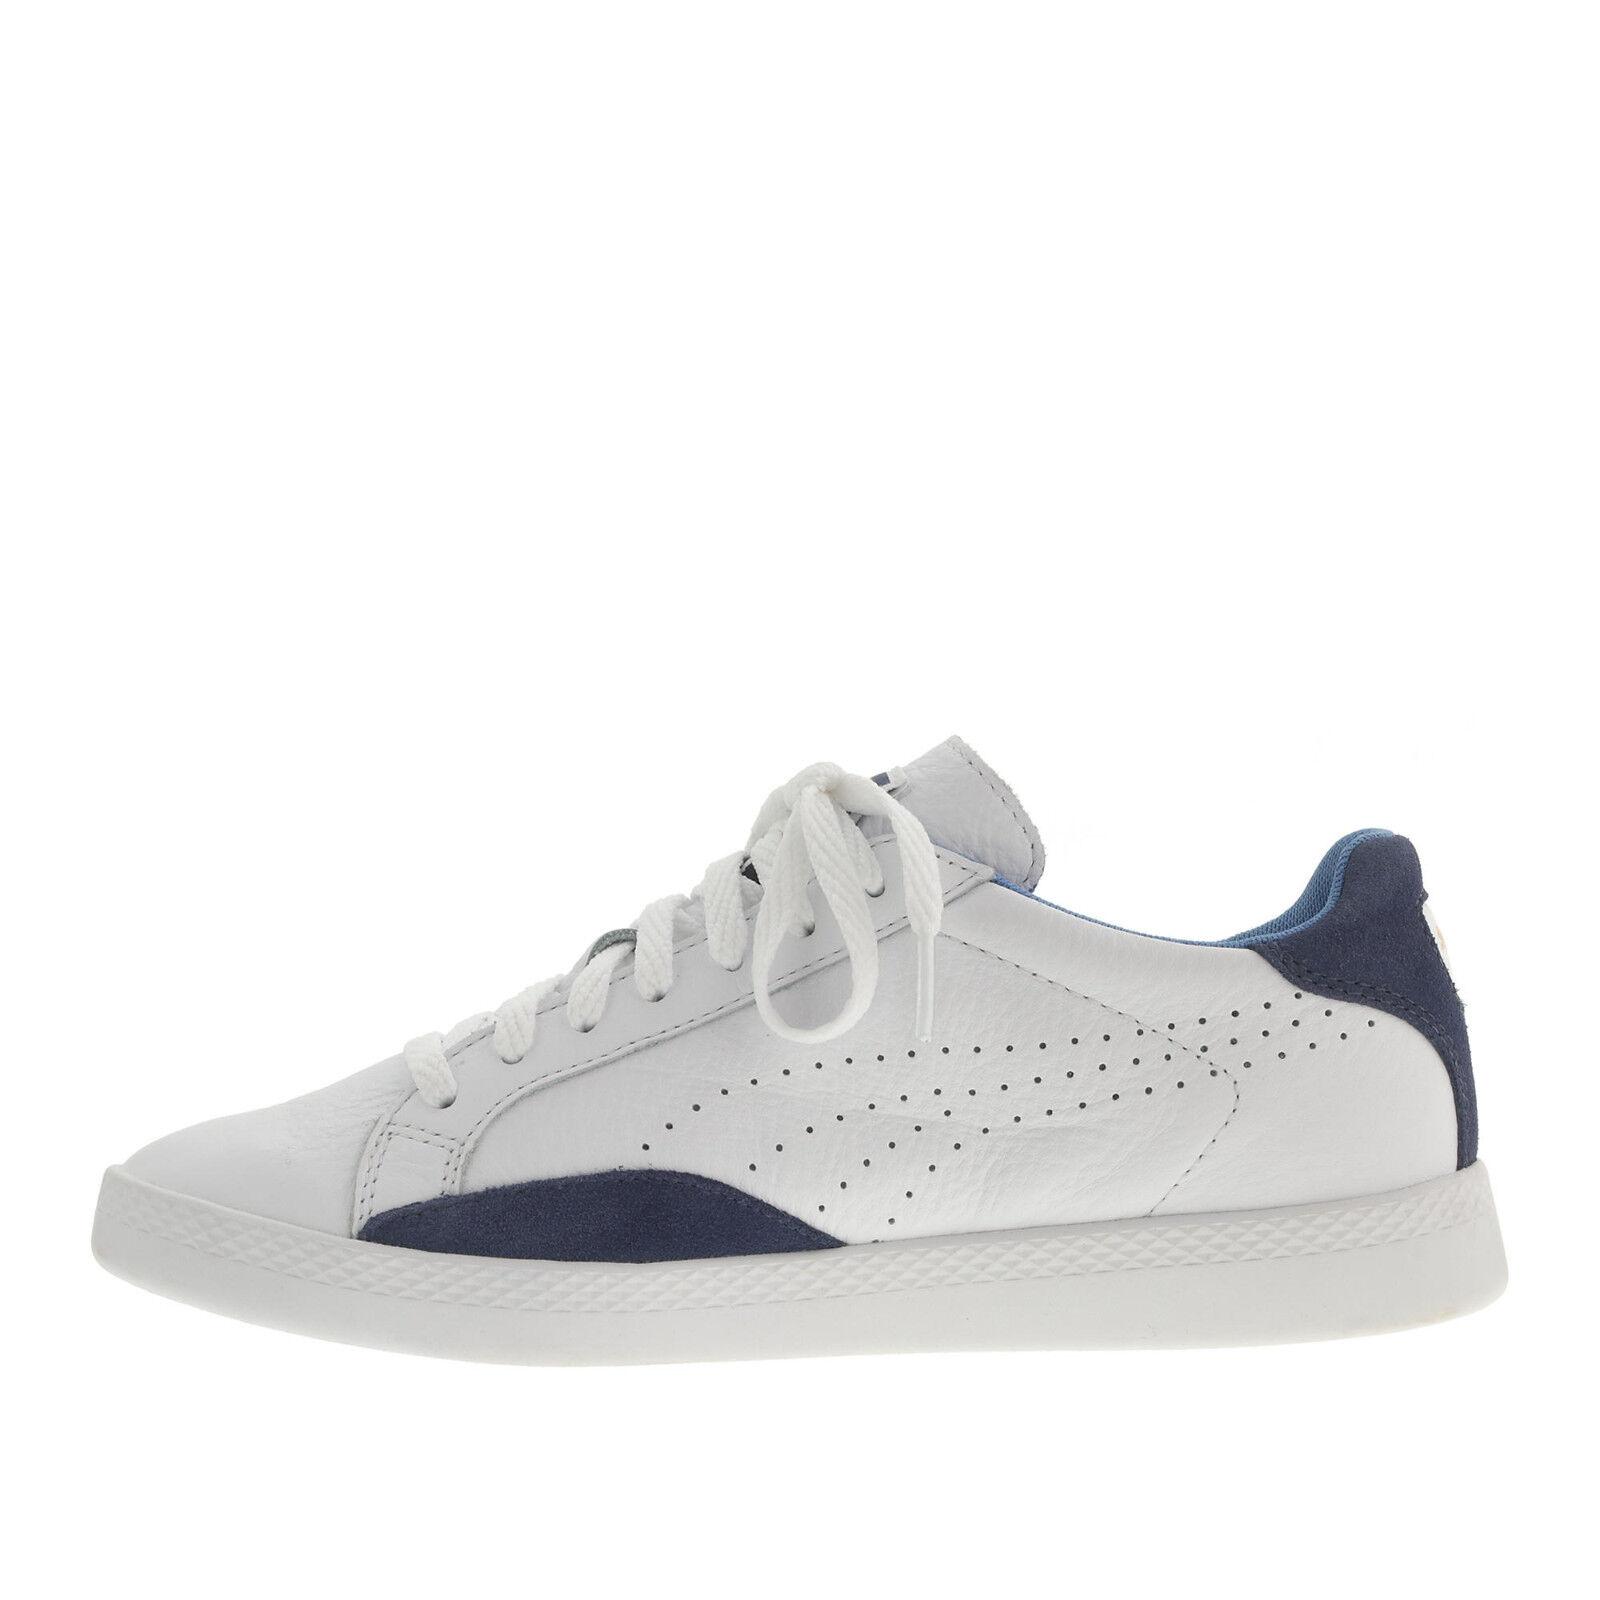 NIB Leder Puma Match Niedrig Sneakers 6.5 Damens Schuhes Leder NIB Sneakers Weiß Navy Blau dfc81e